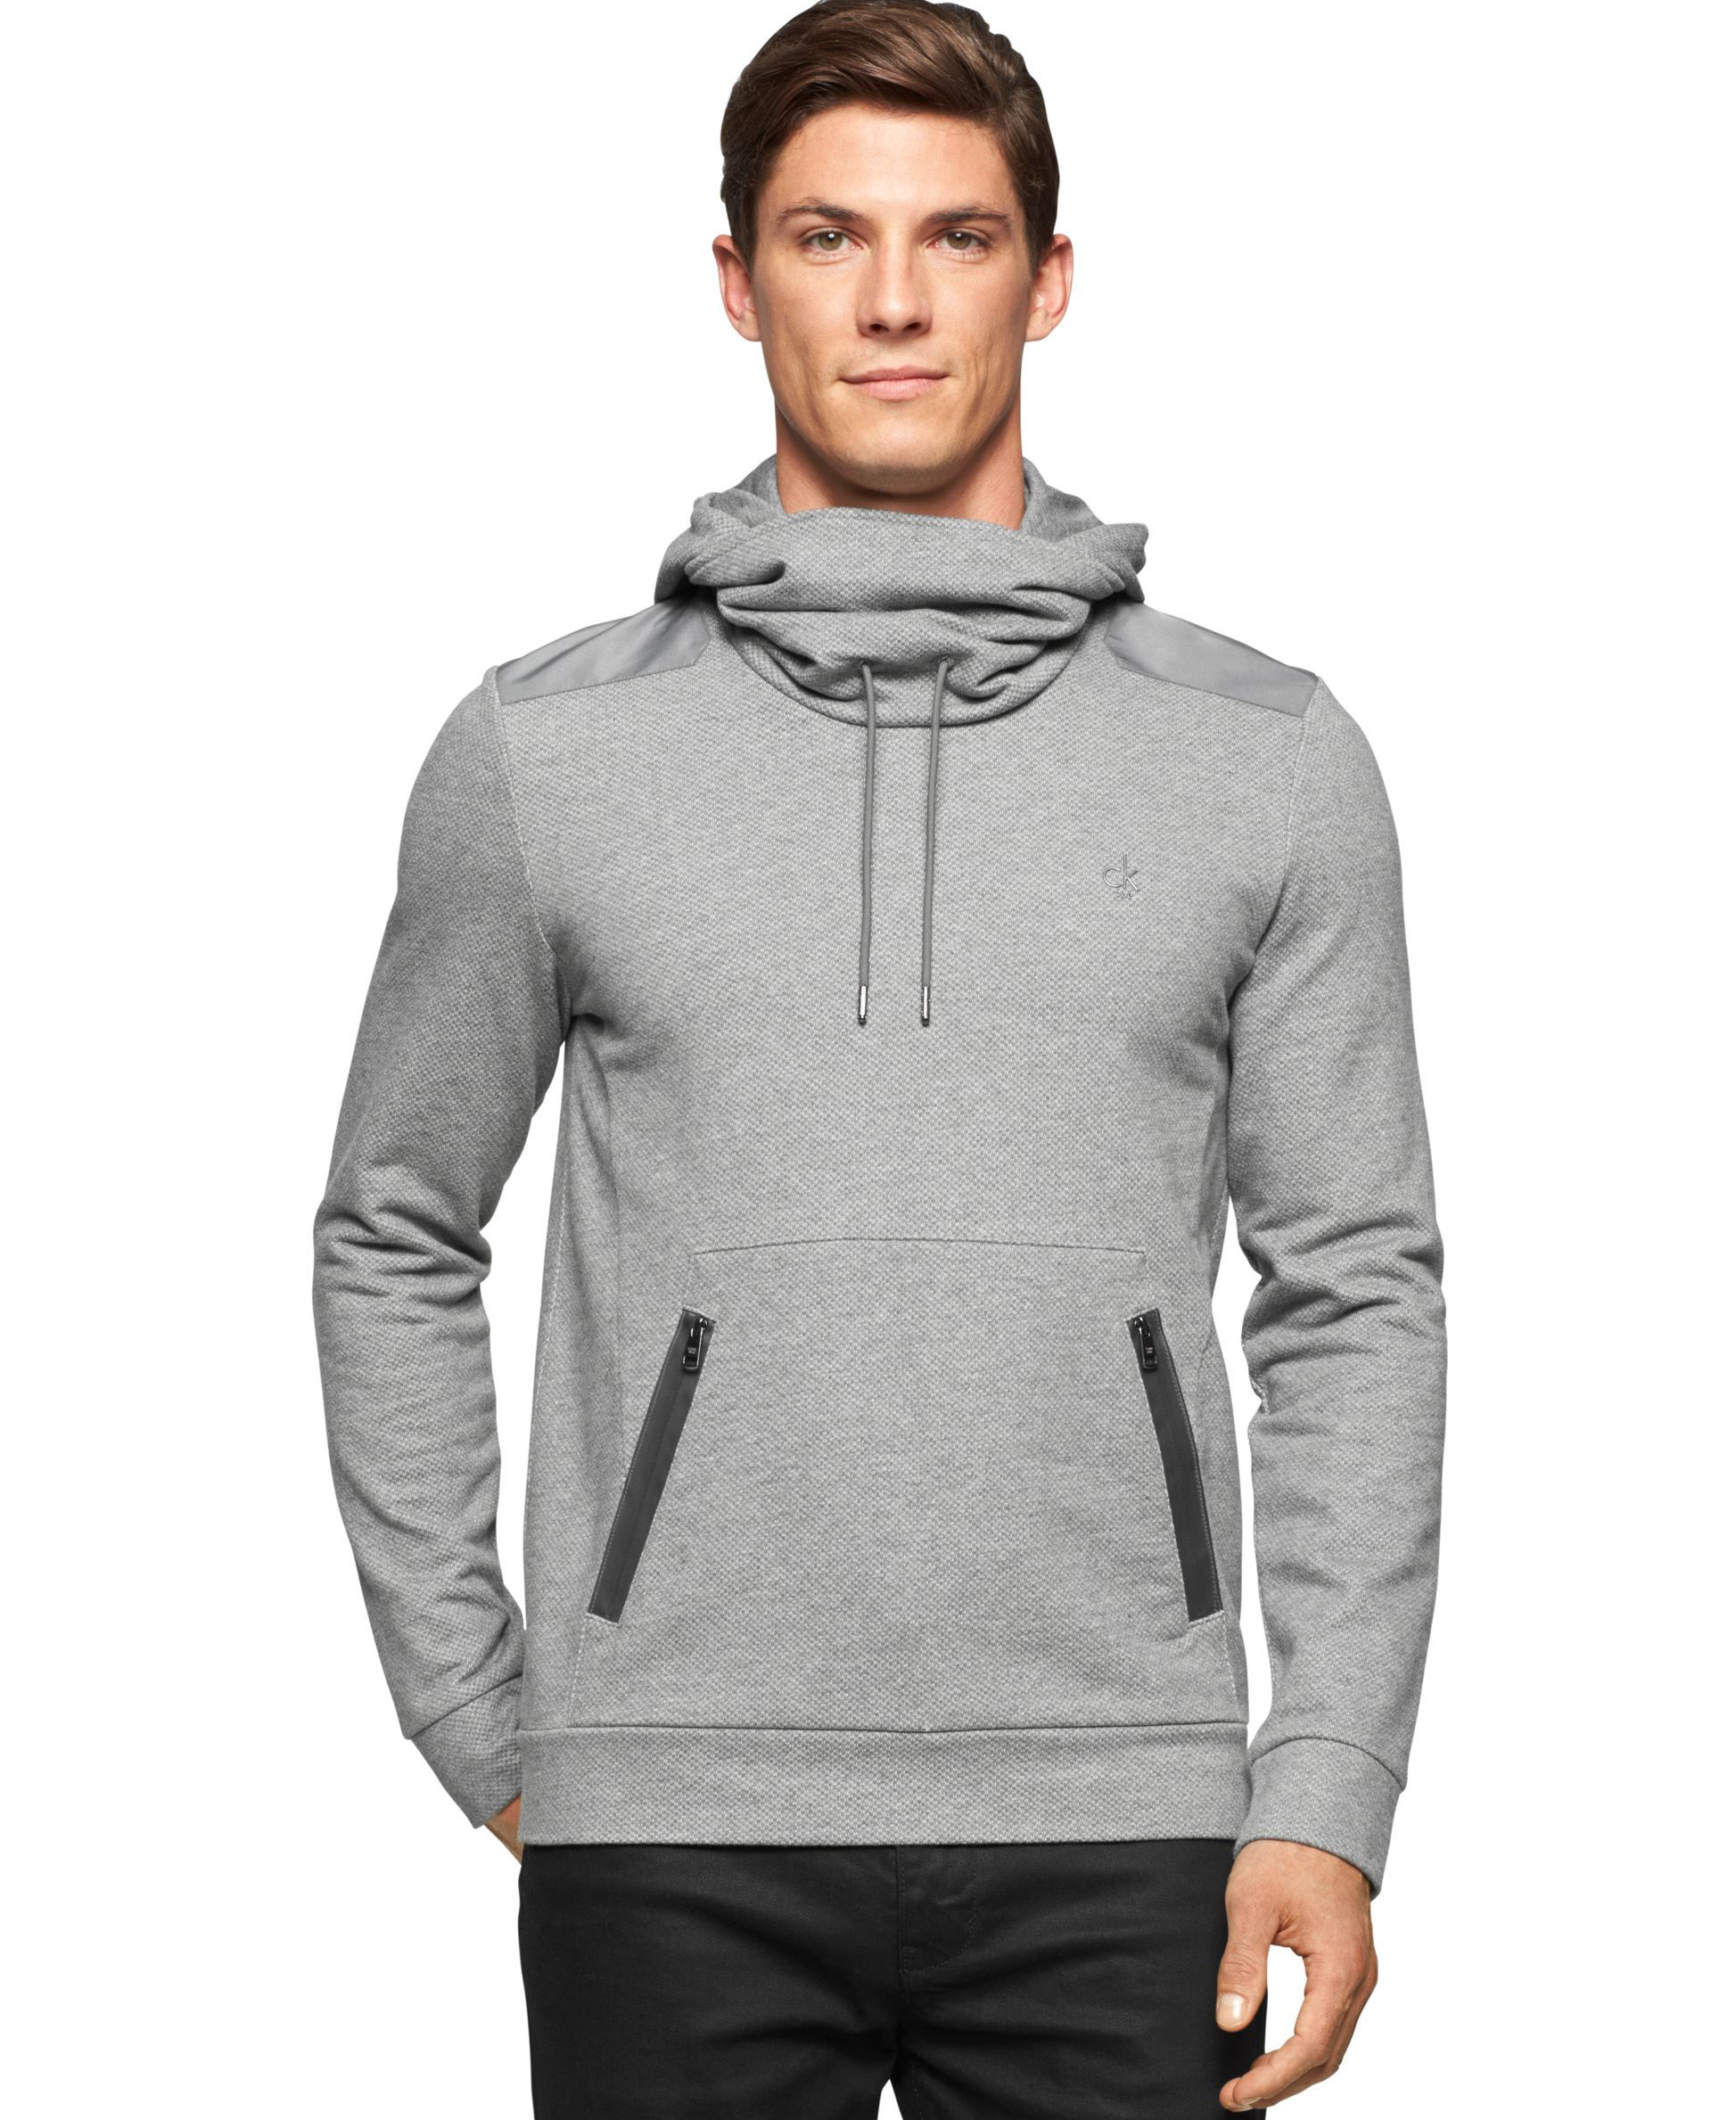 Calvin Klein Funnel Neck Pullover Sweatshirt Hoodie In